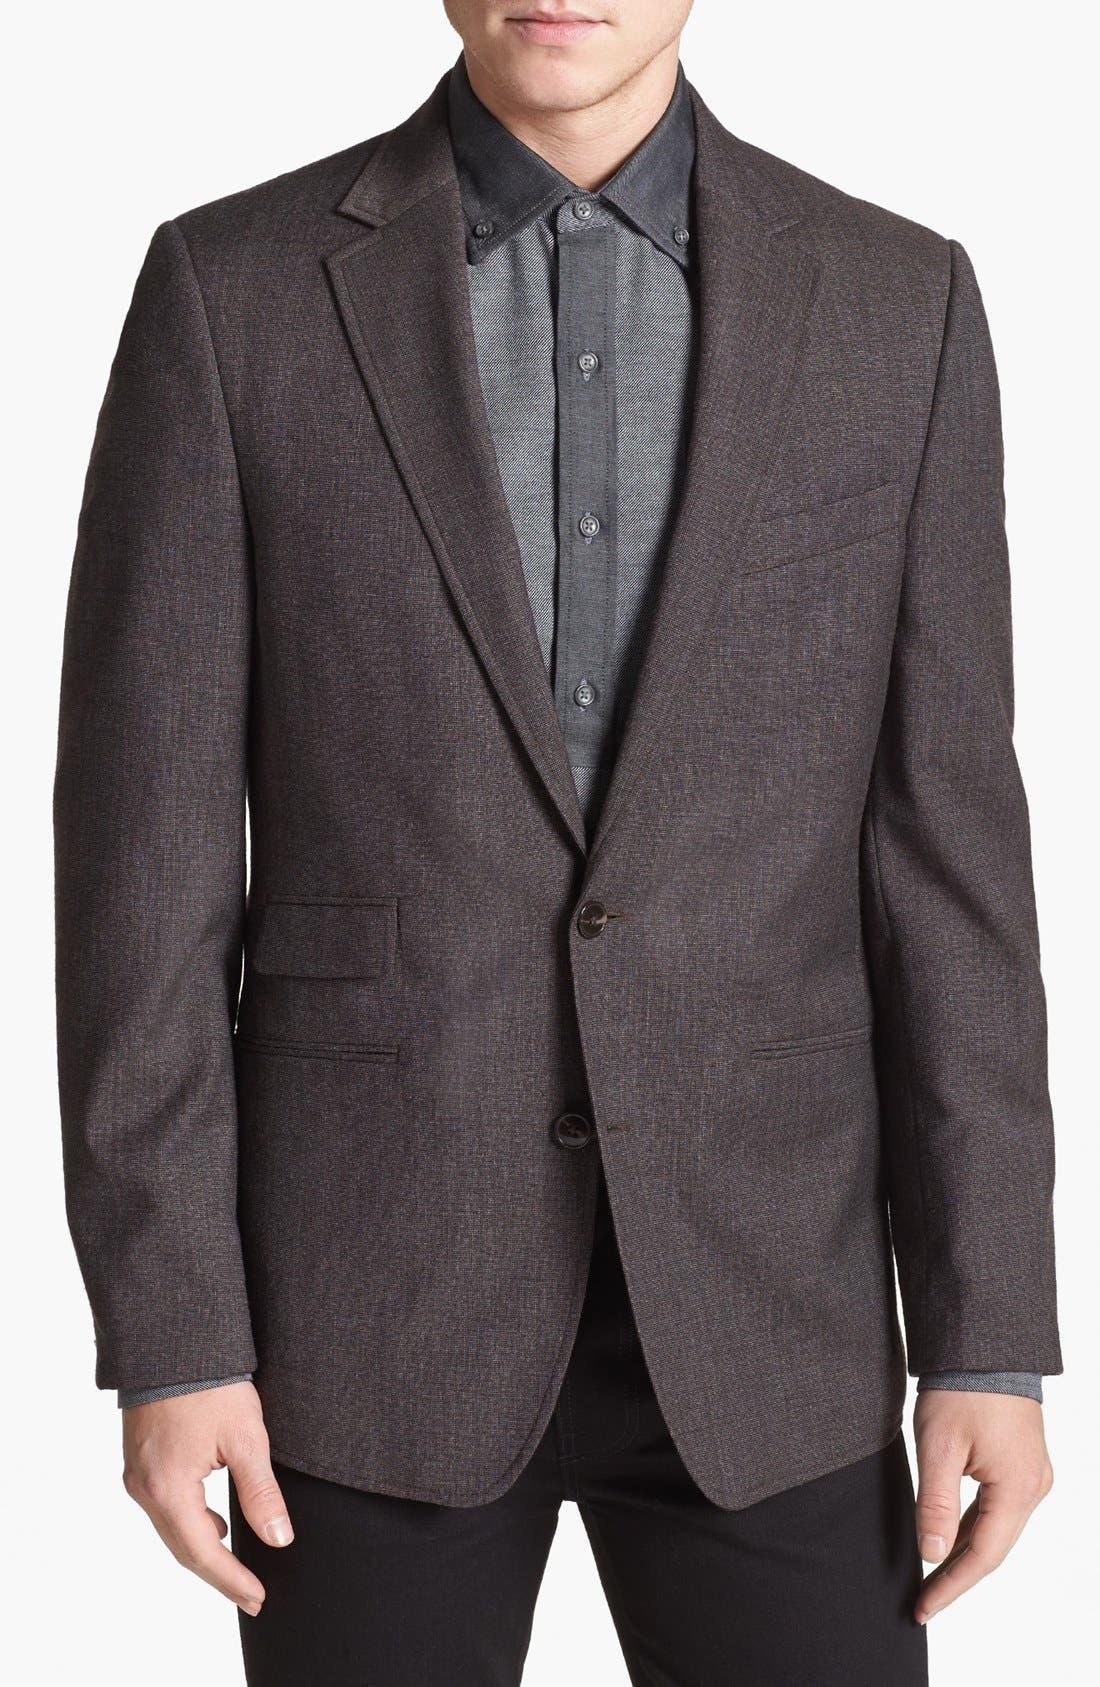 Alternate Image 1 Selected - Vince Camuto Slim Fit Wool Sportcoat